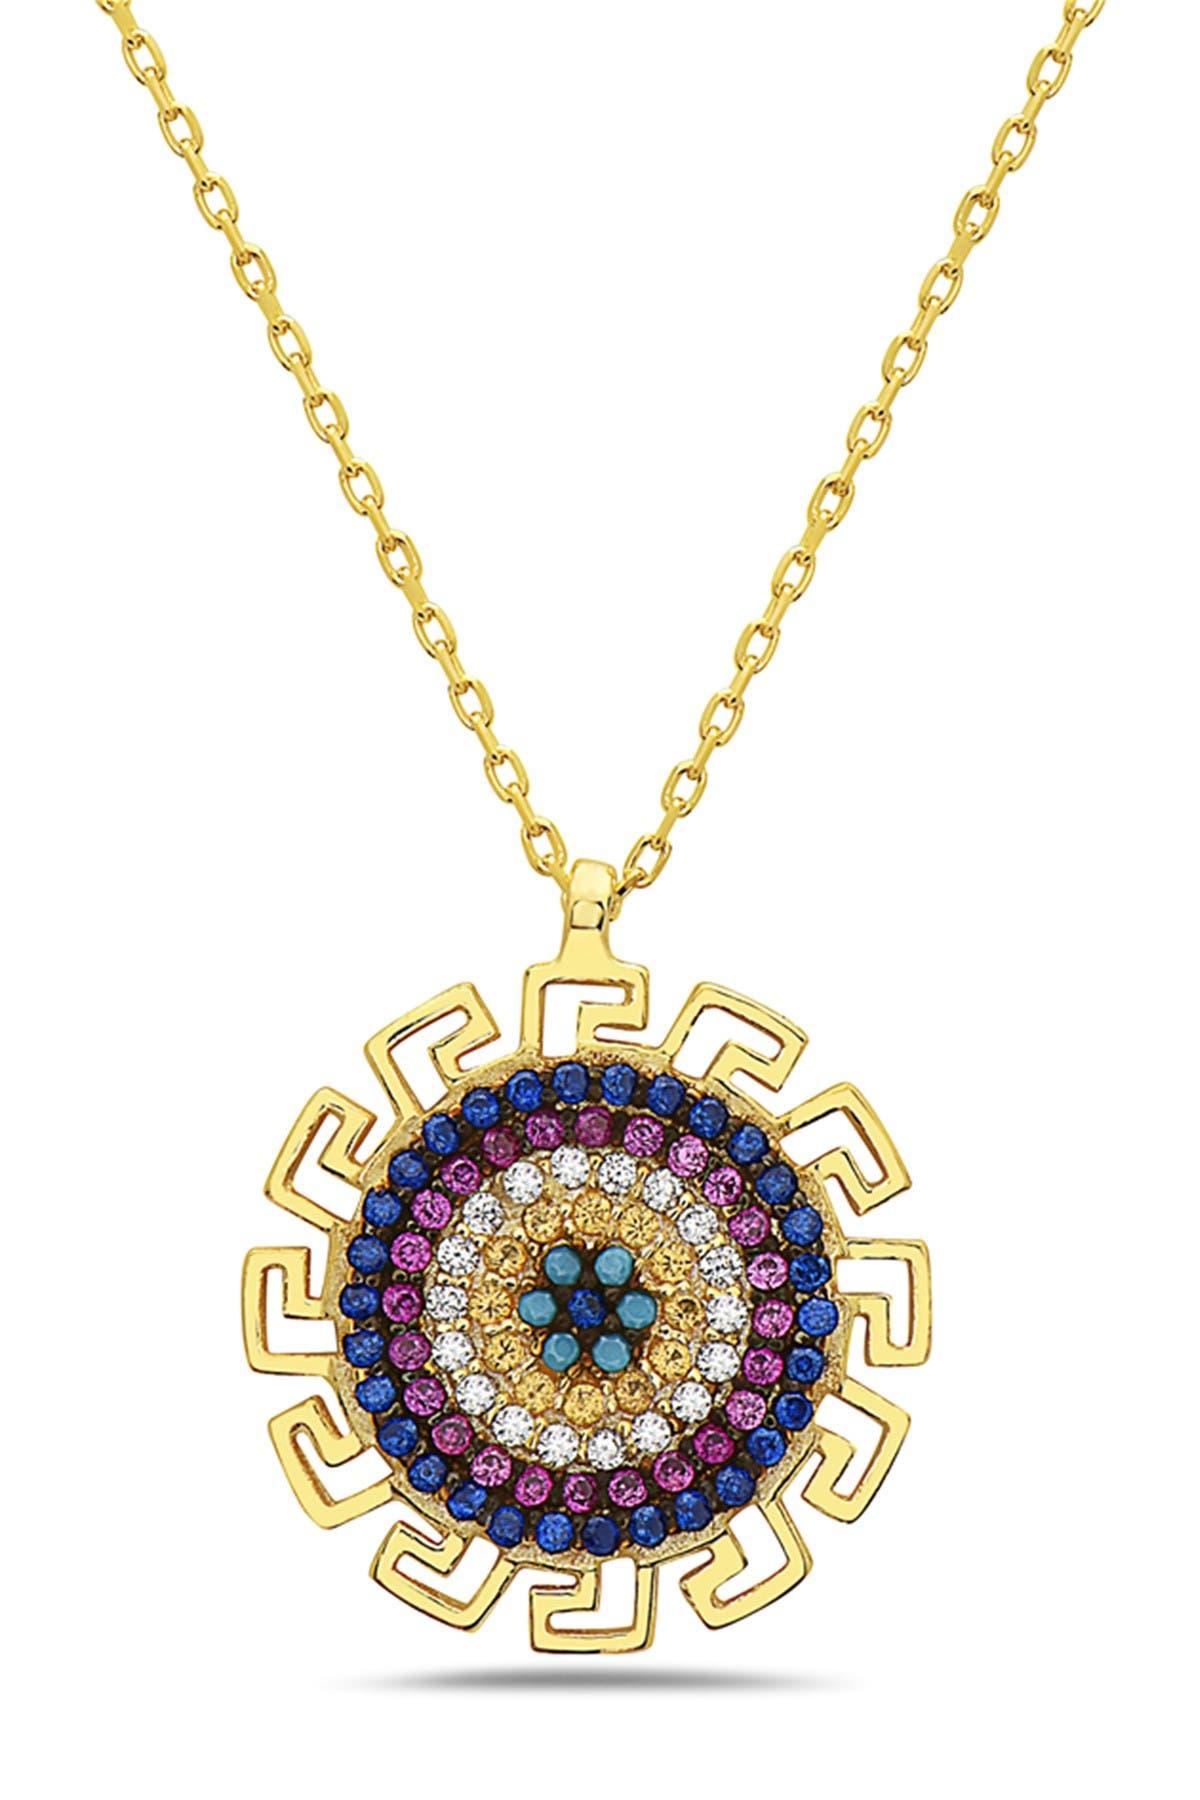 Image of Best Silver Inc. 18K Gold Plated Sterling Silver Crystal Multi Color Greek Design Disk Necklace